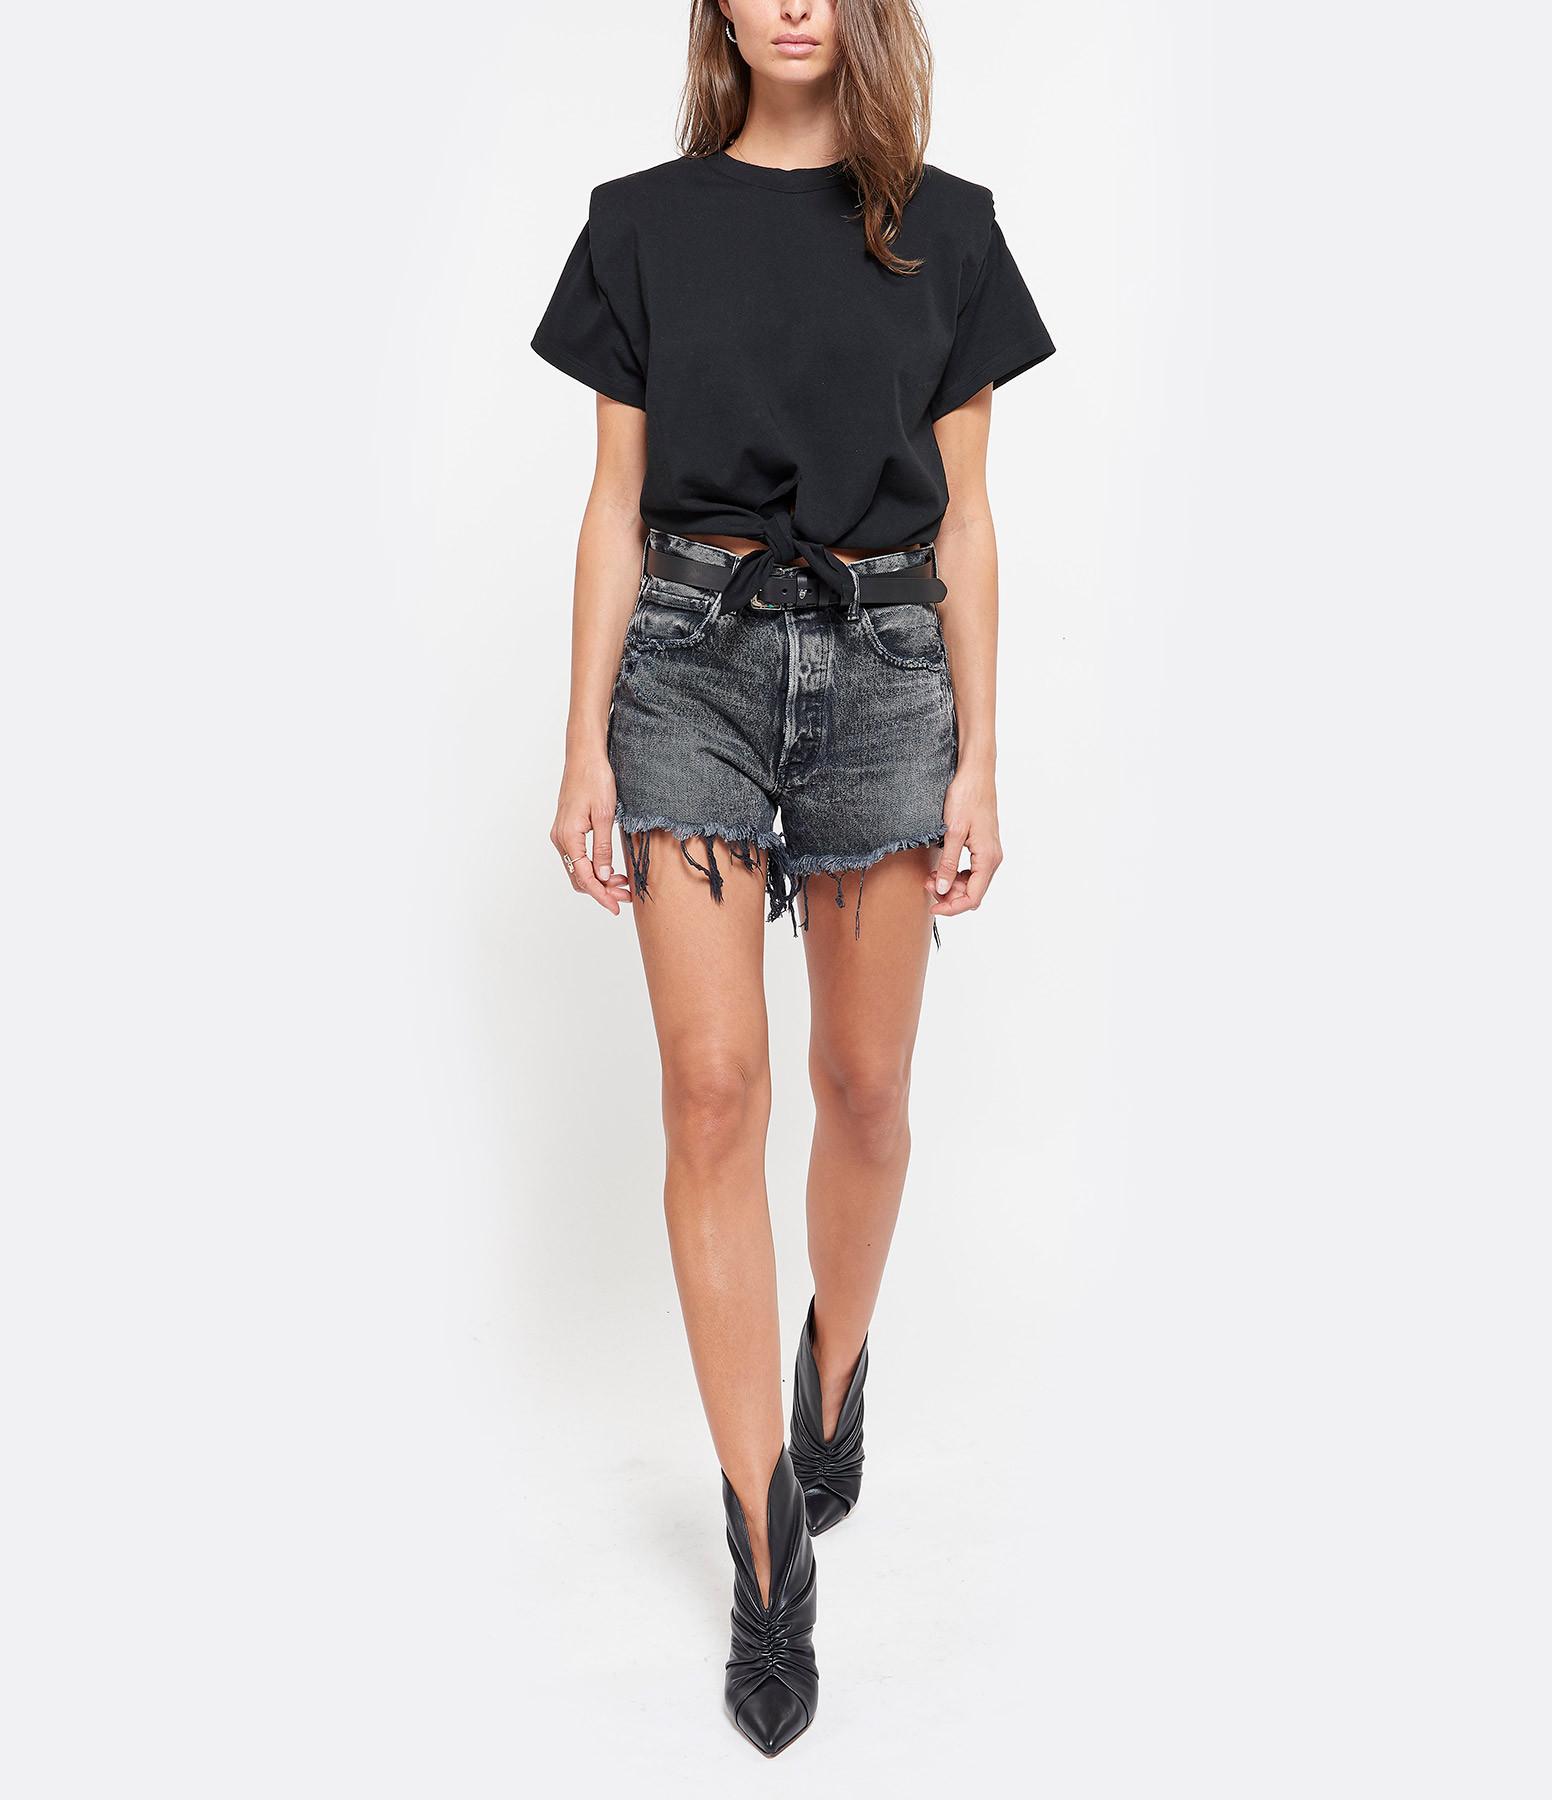 ISABEL MARANT - Tee-shirt Belita Noué Coton Noir